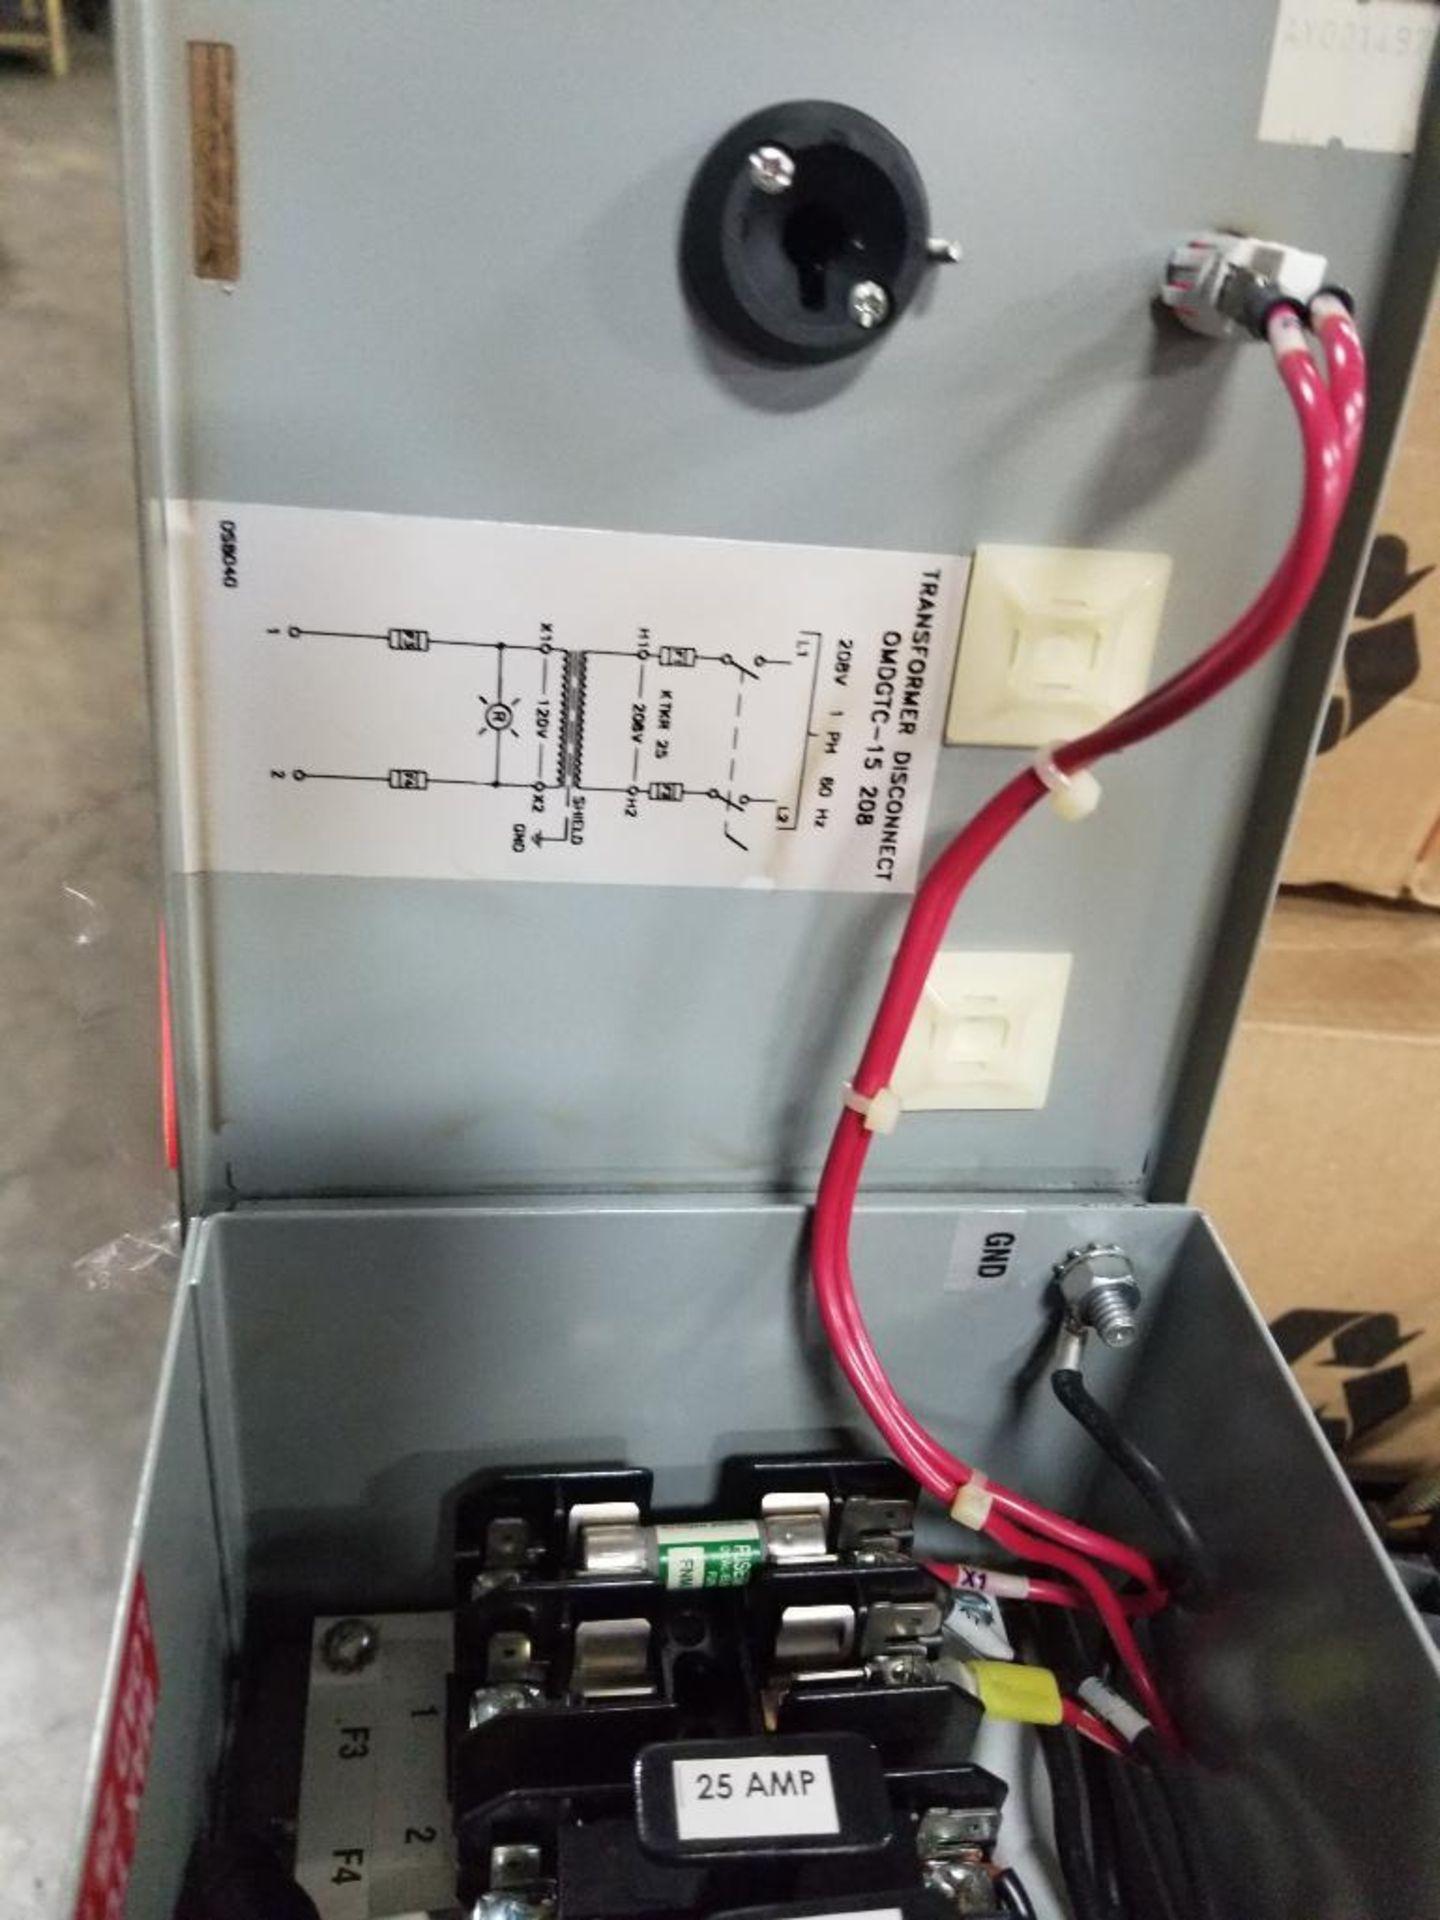 Daykin OMDGTC-15 208V Transformer. - Image 6 of 7